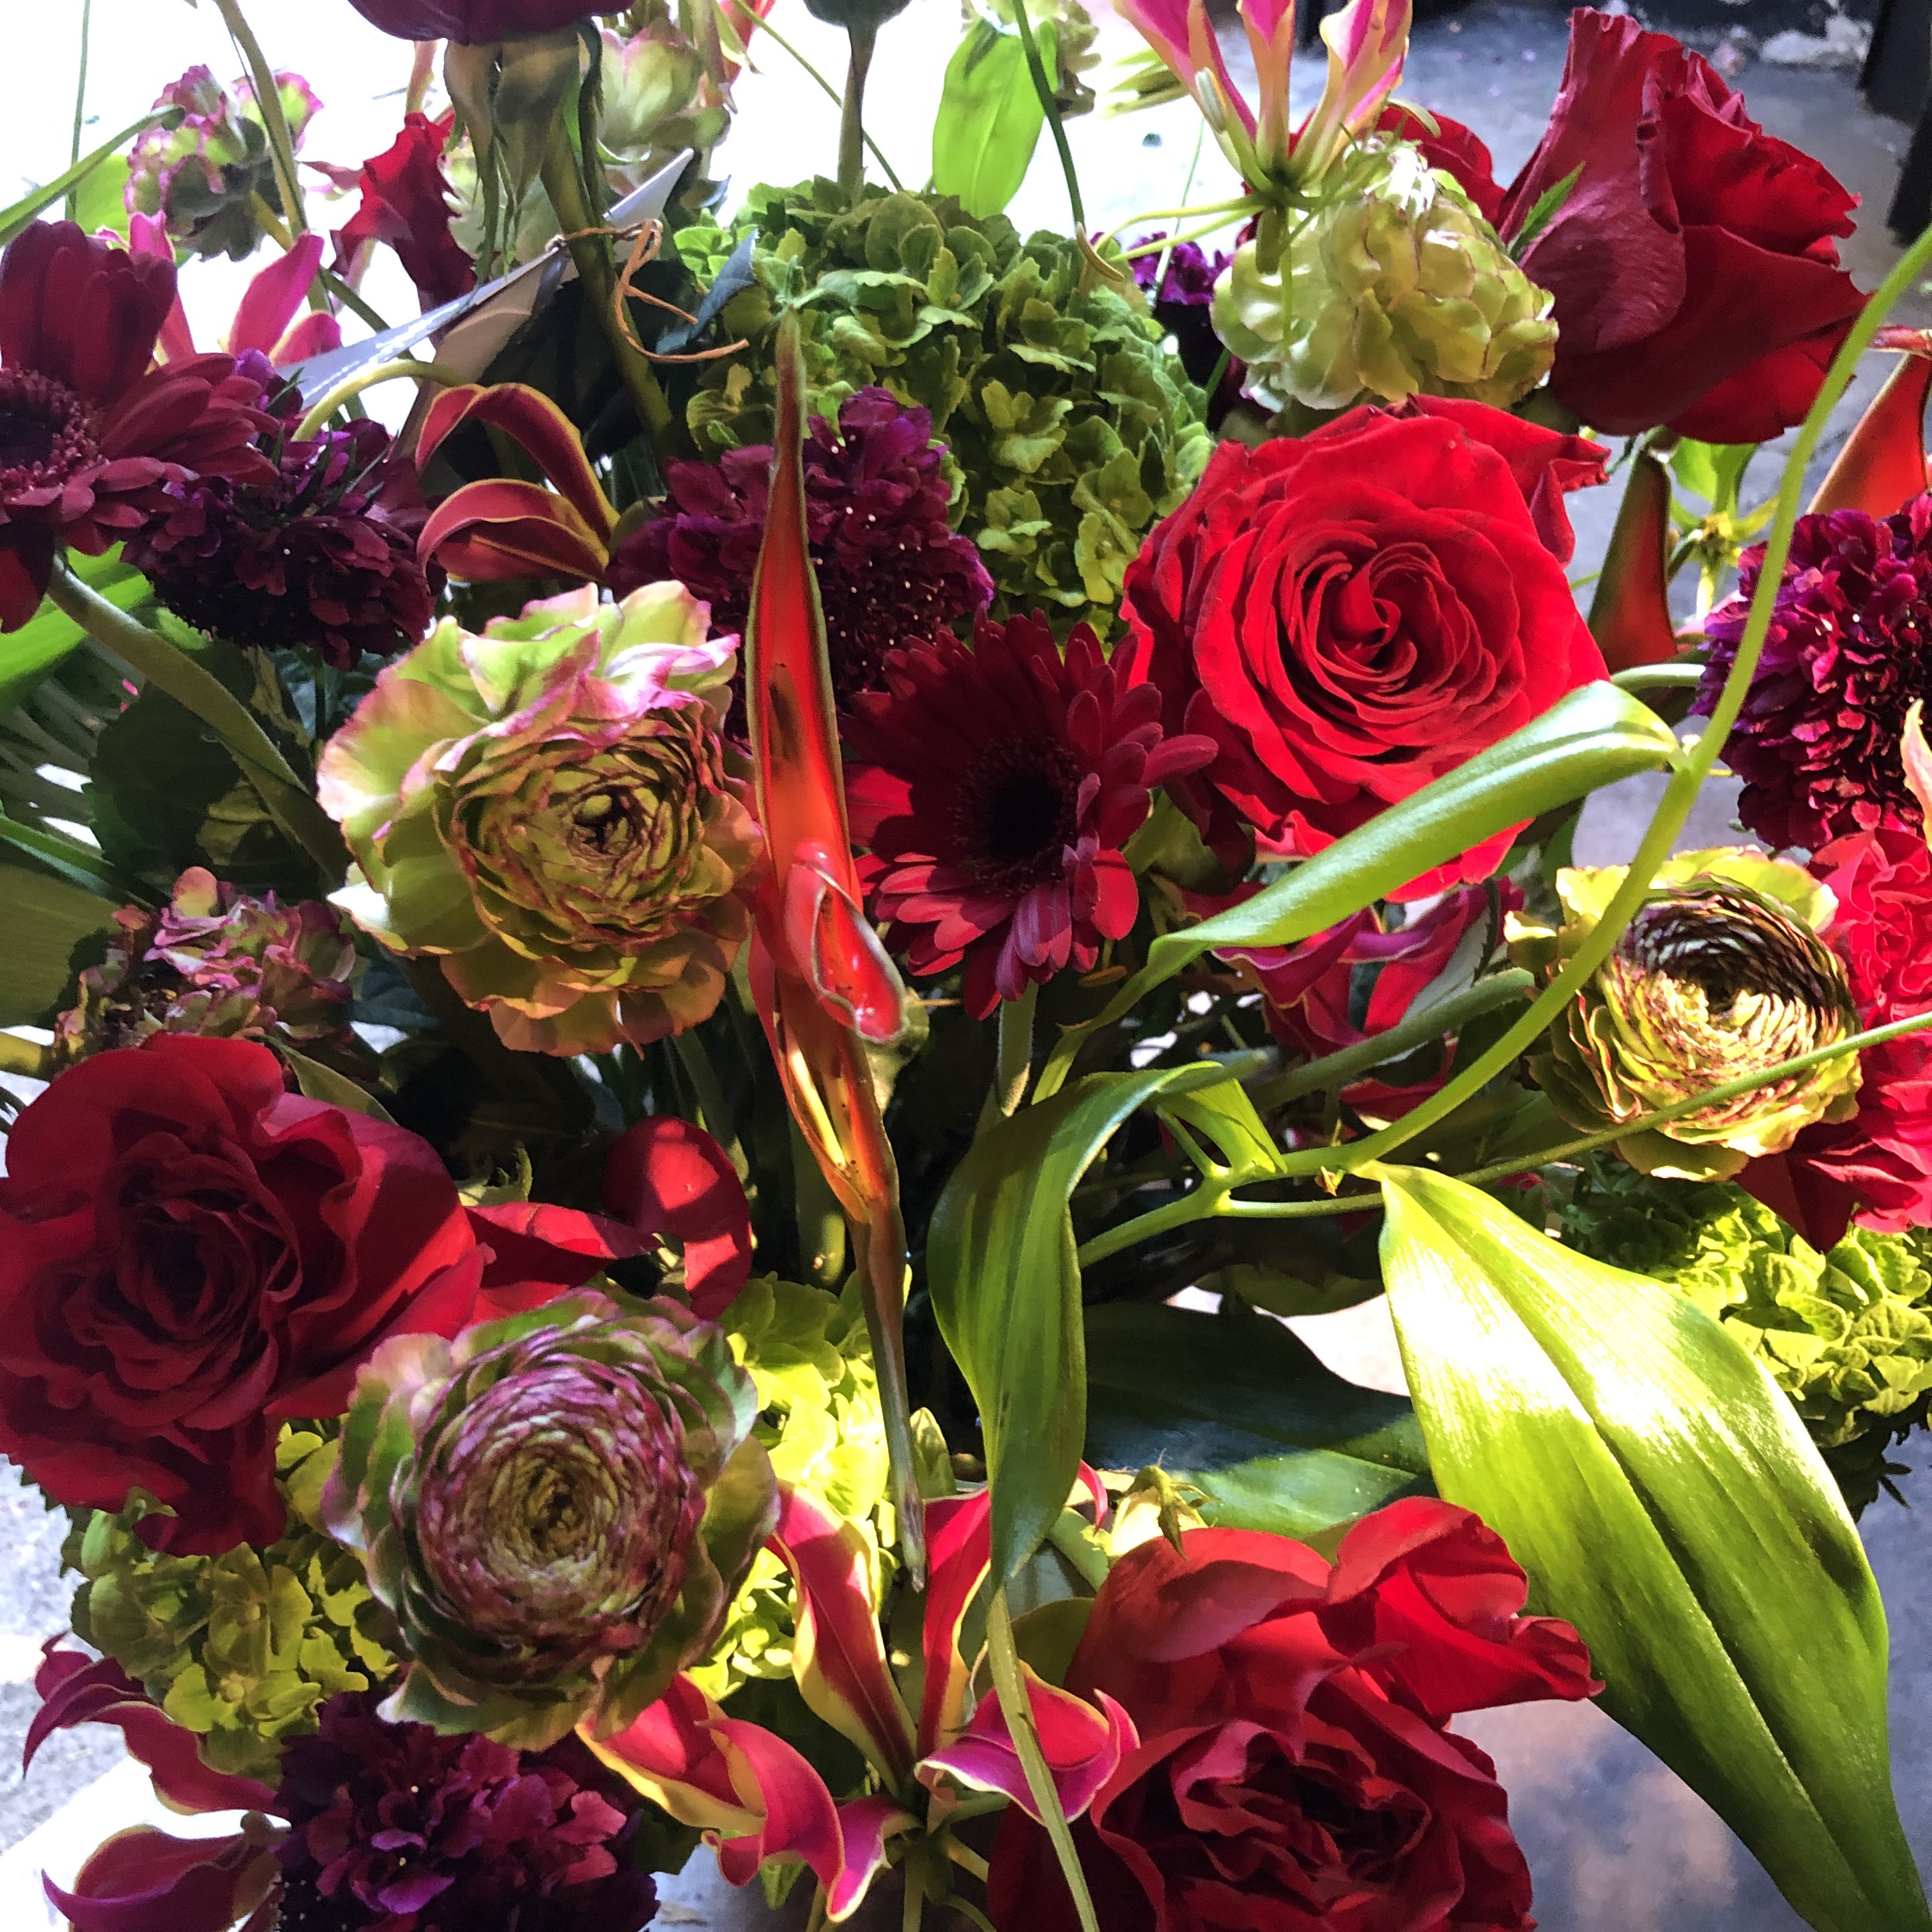 flores madrid floristeria madrid servicio a domicilio